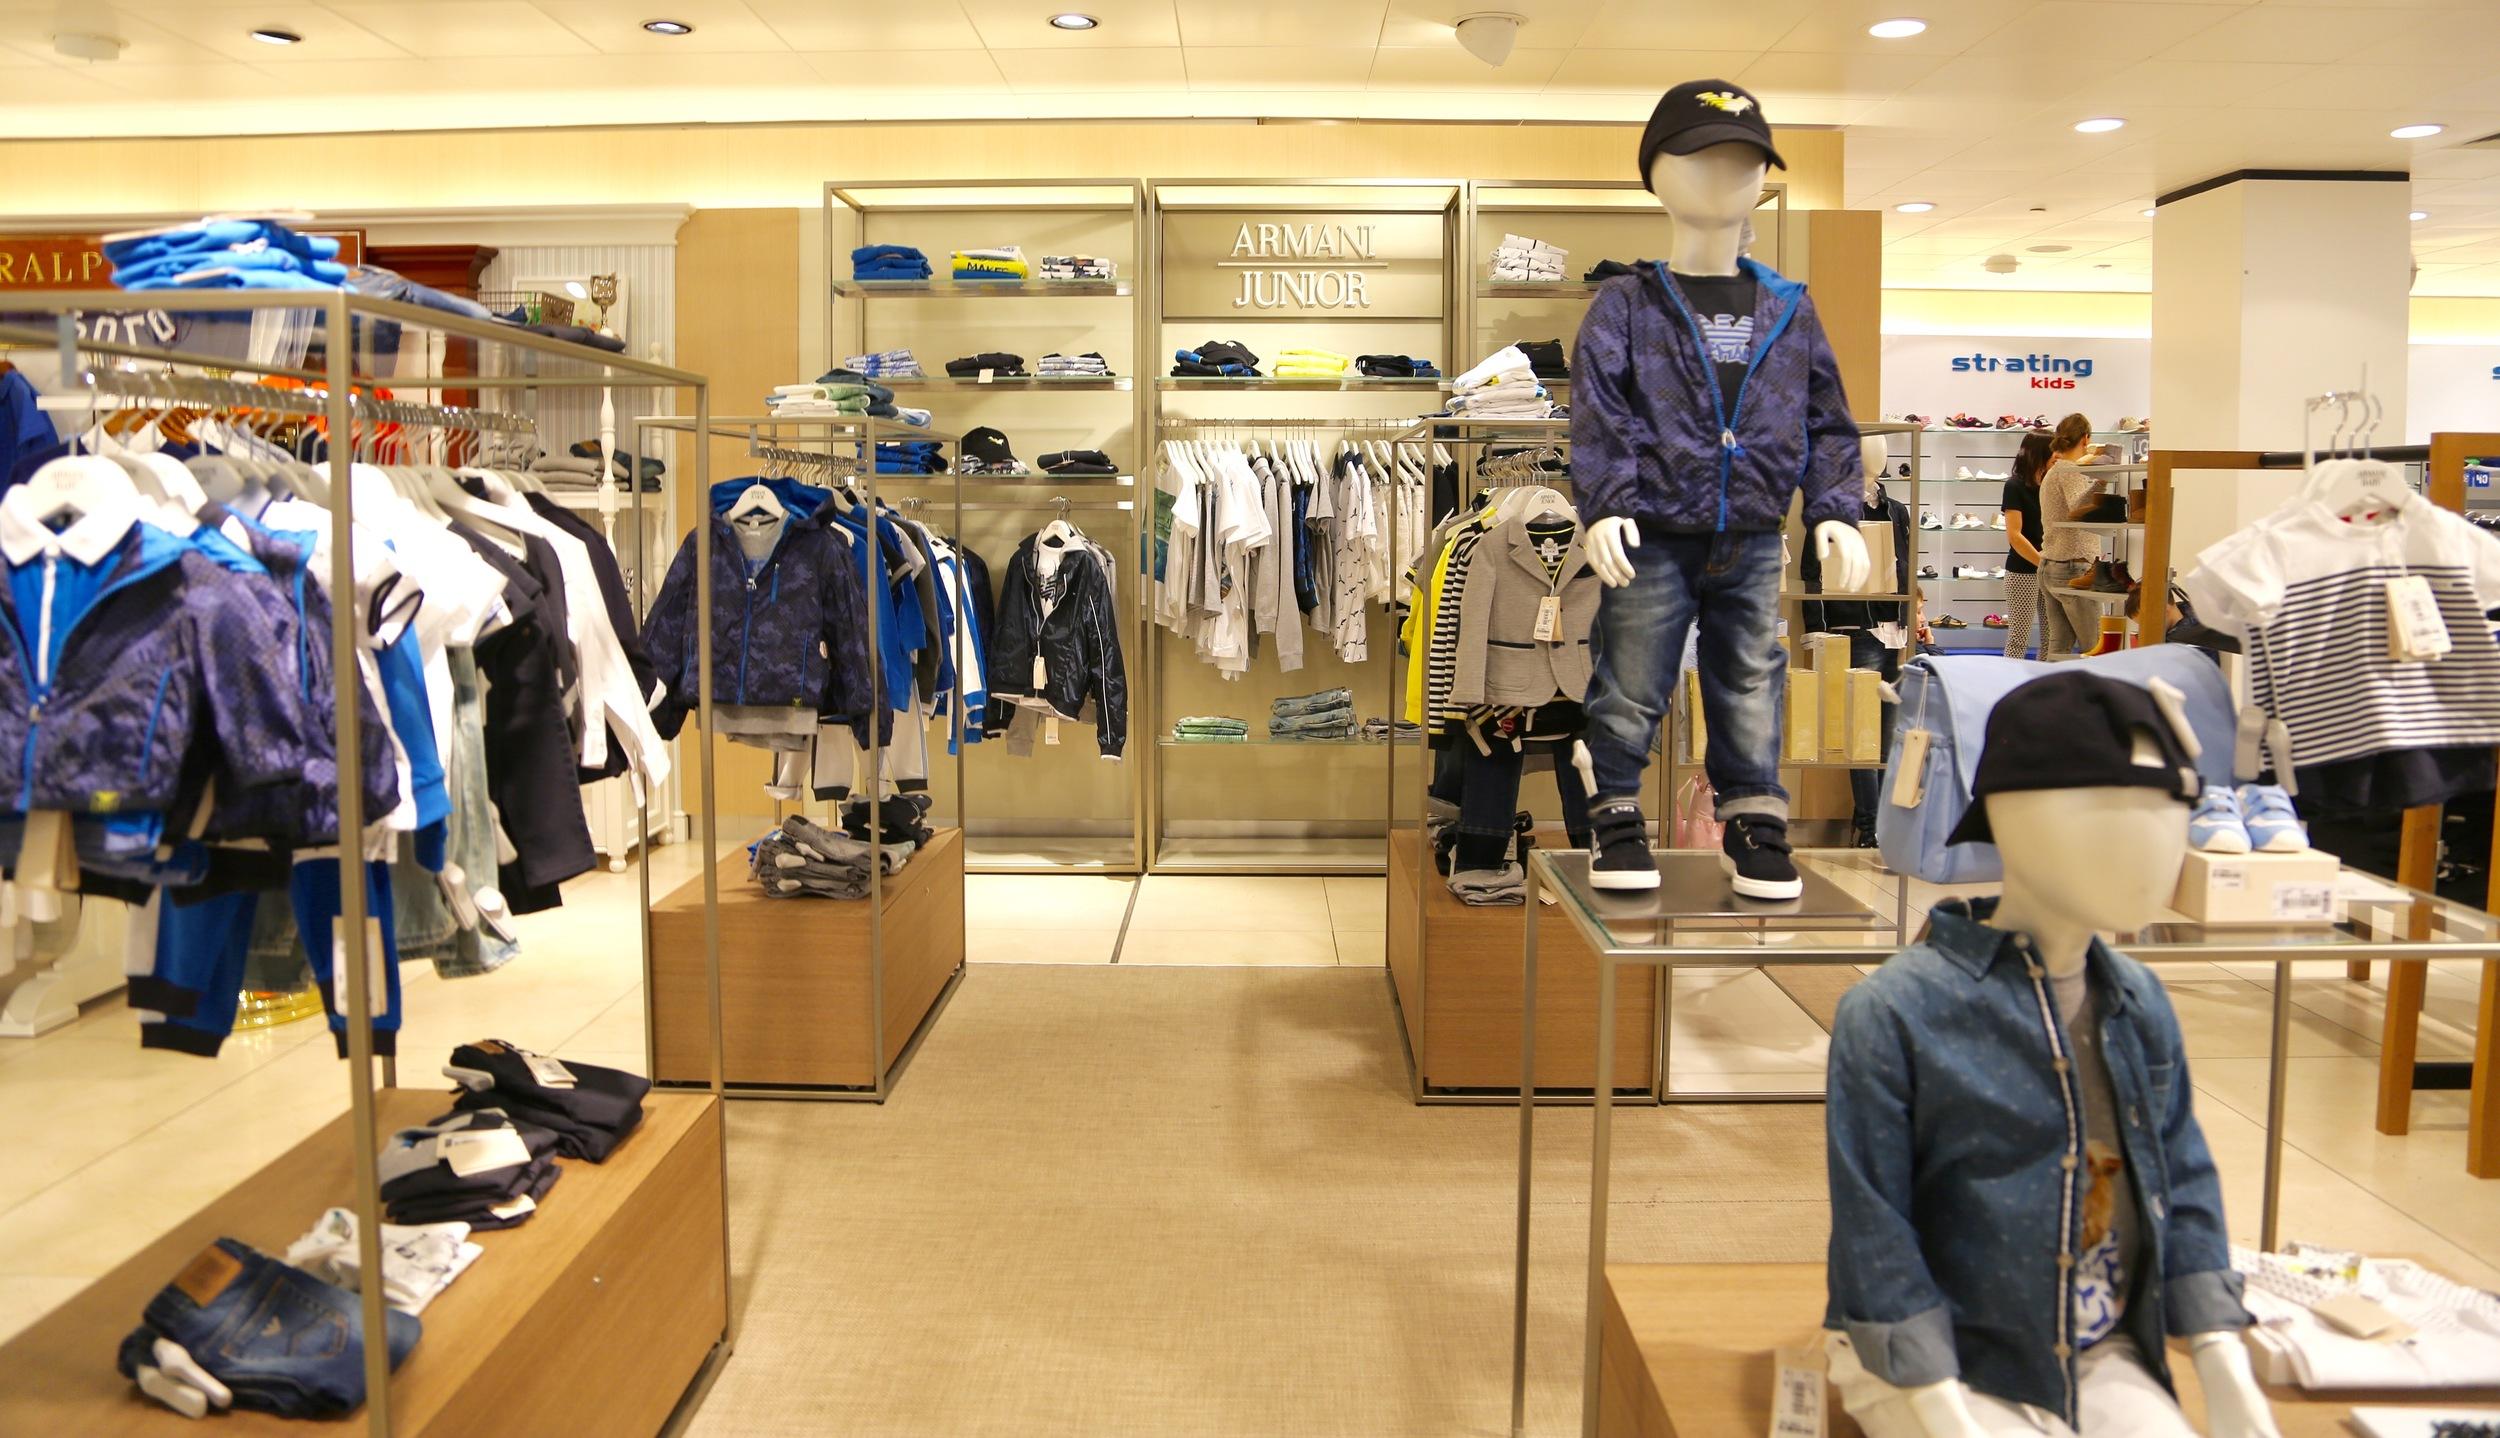 Armani junior i shoppingsenteret.                        Foto: Odd Roar Lange